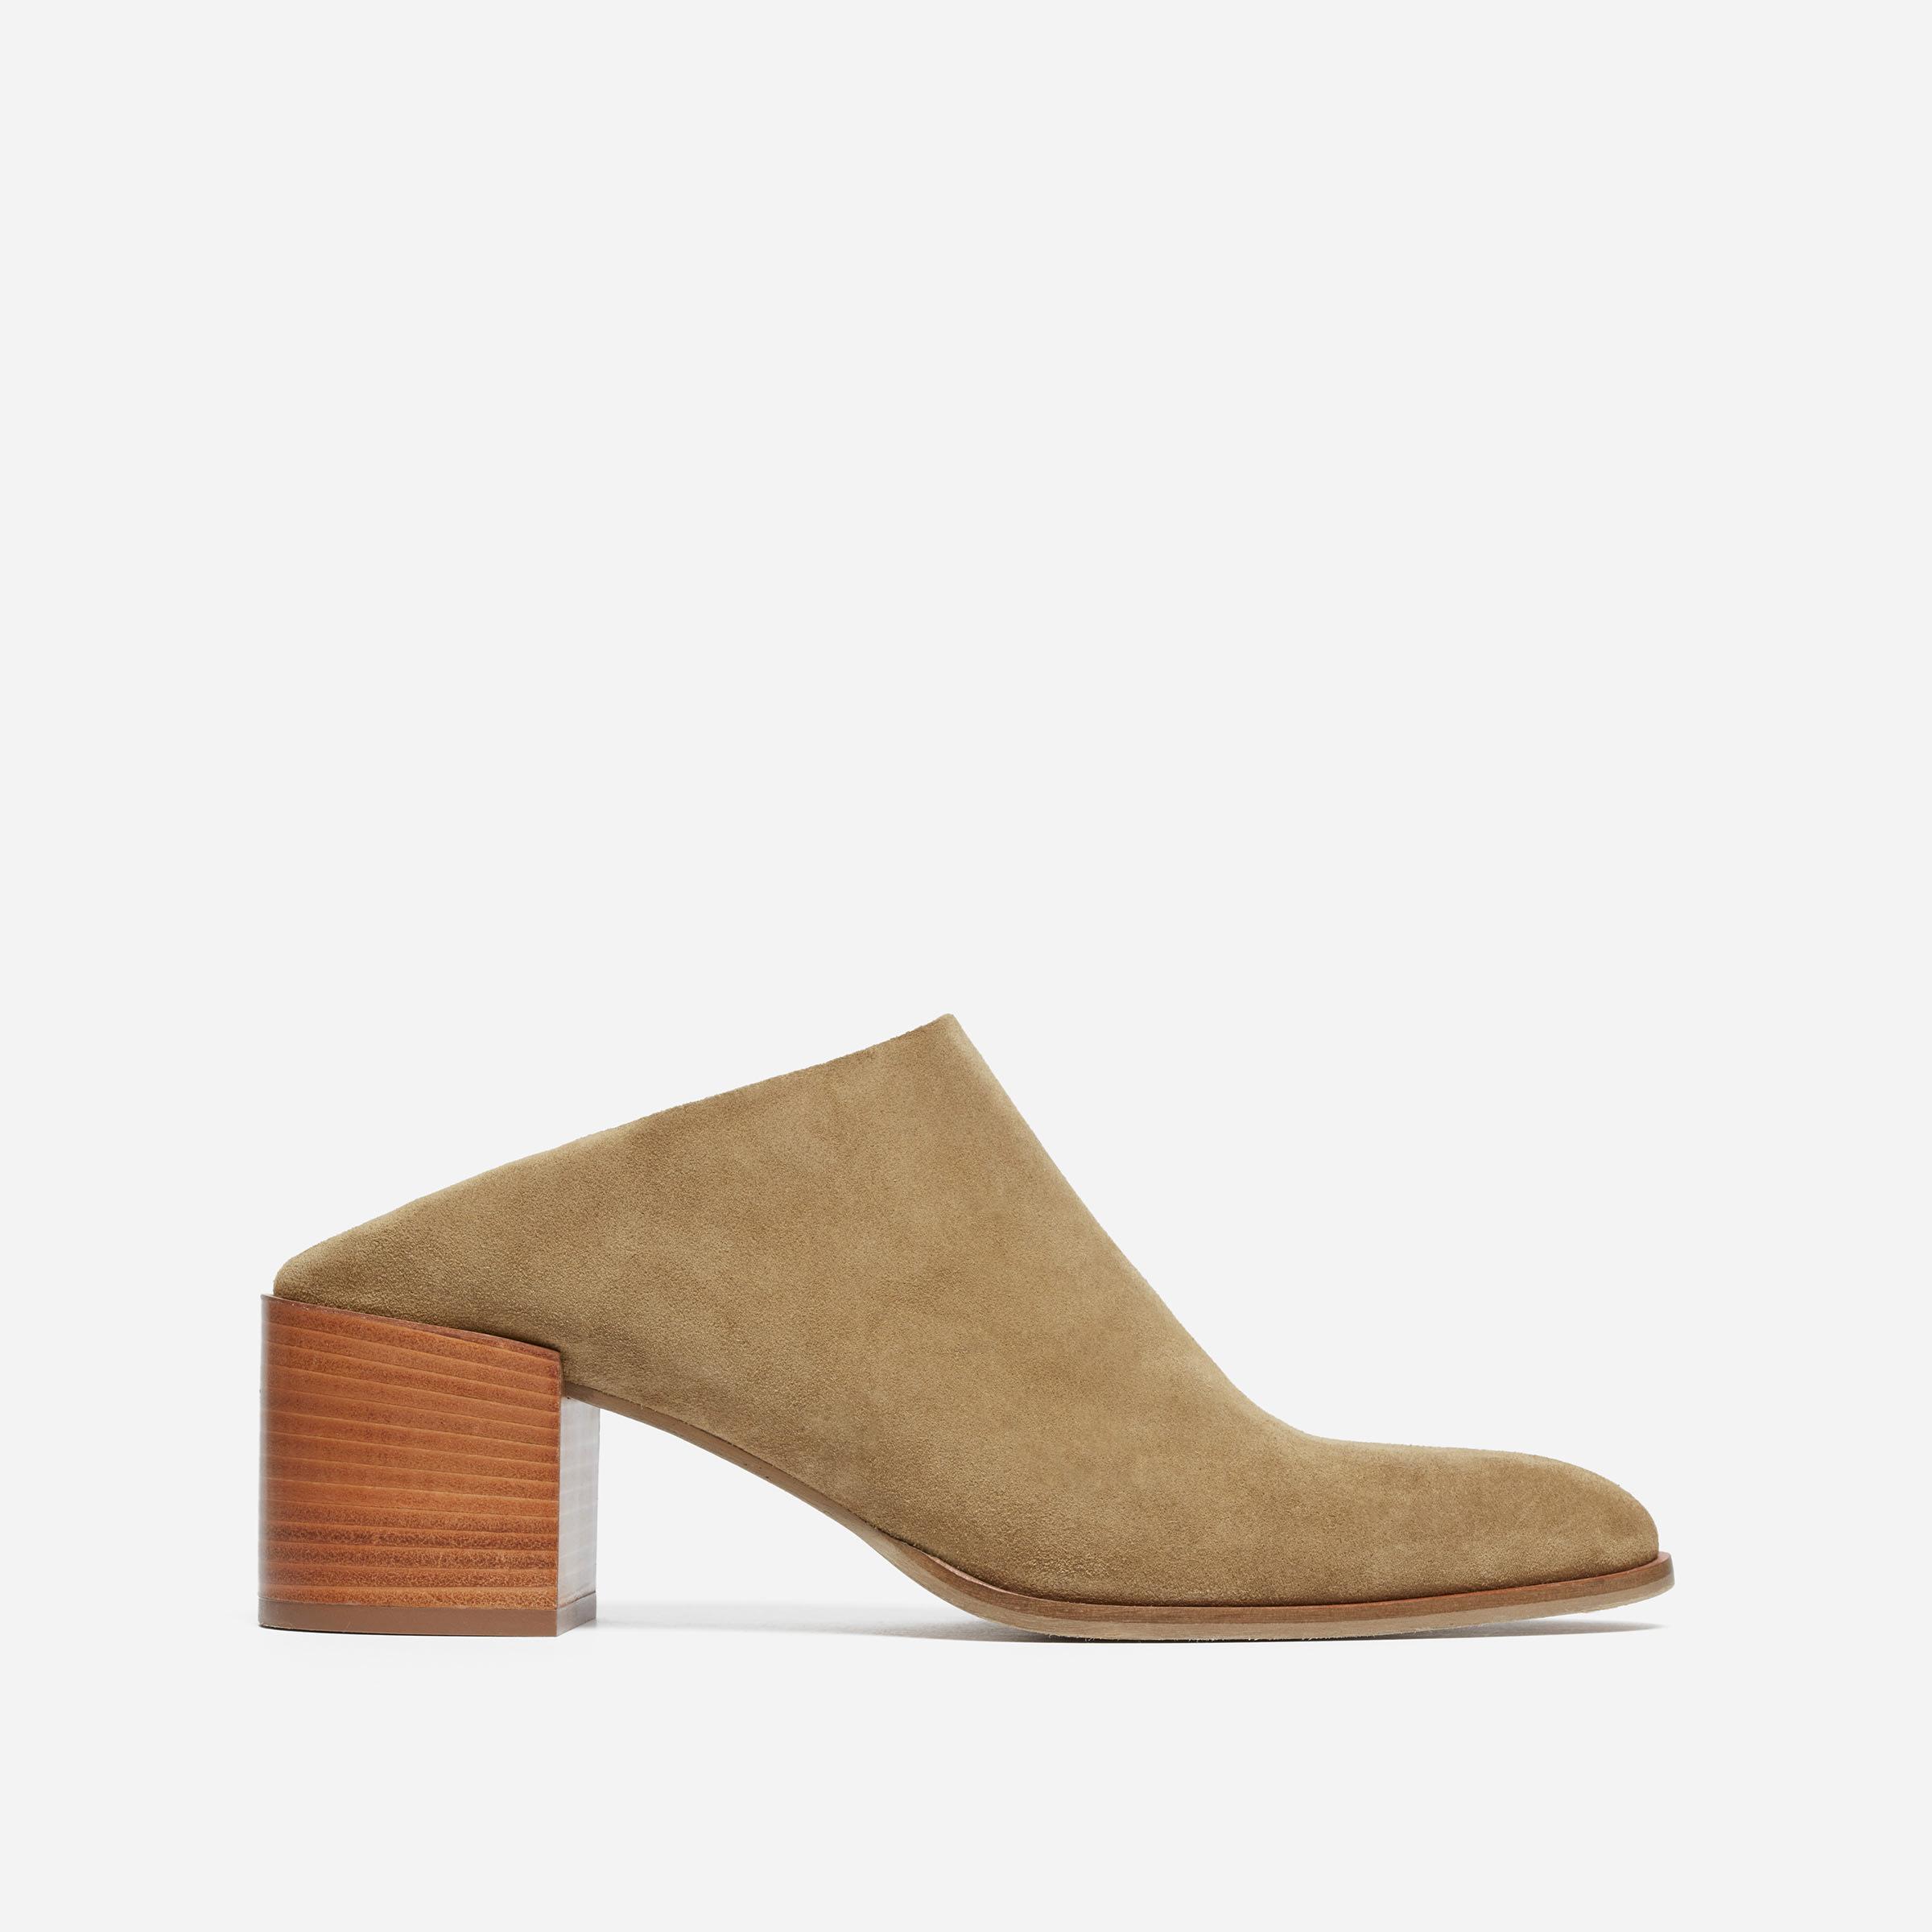 fcdc683198d0 The Suede Heel Mule —  198